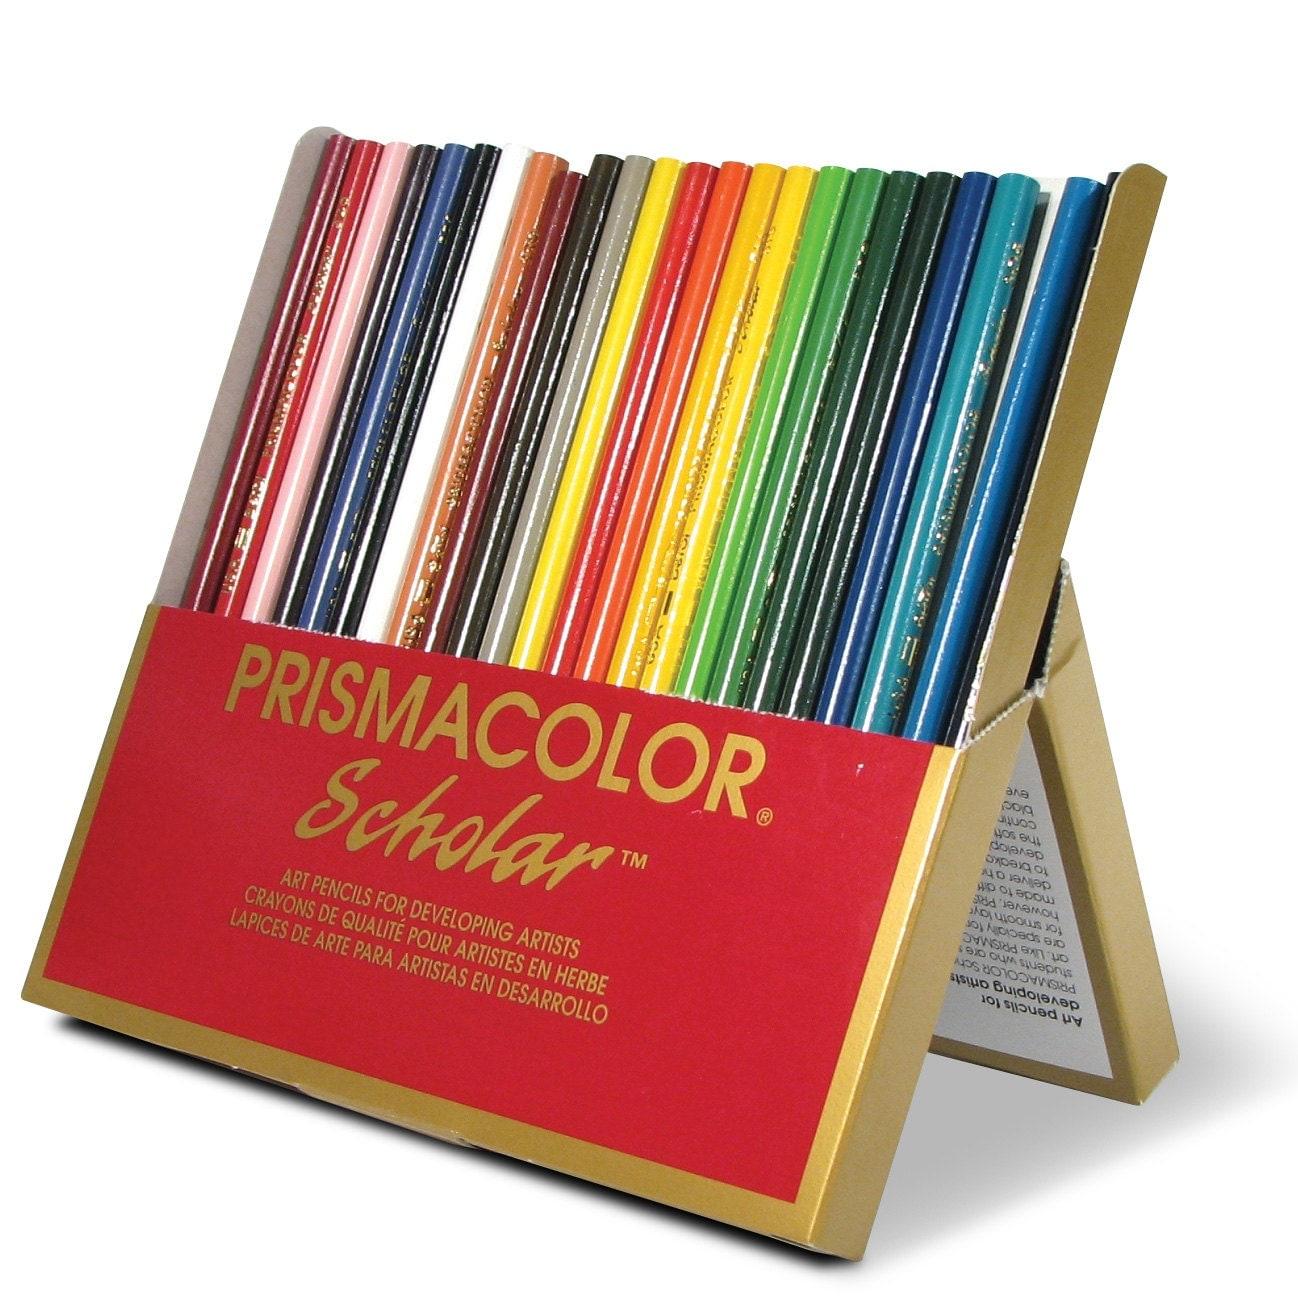 Prismacolor Scholar Colored Pencil 24-Piece Set